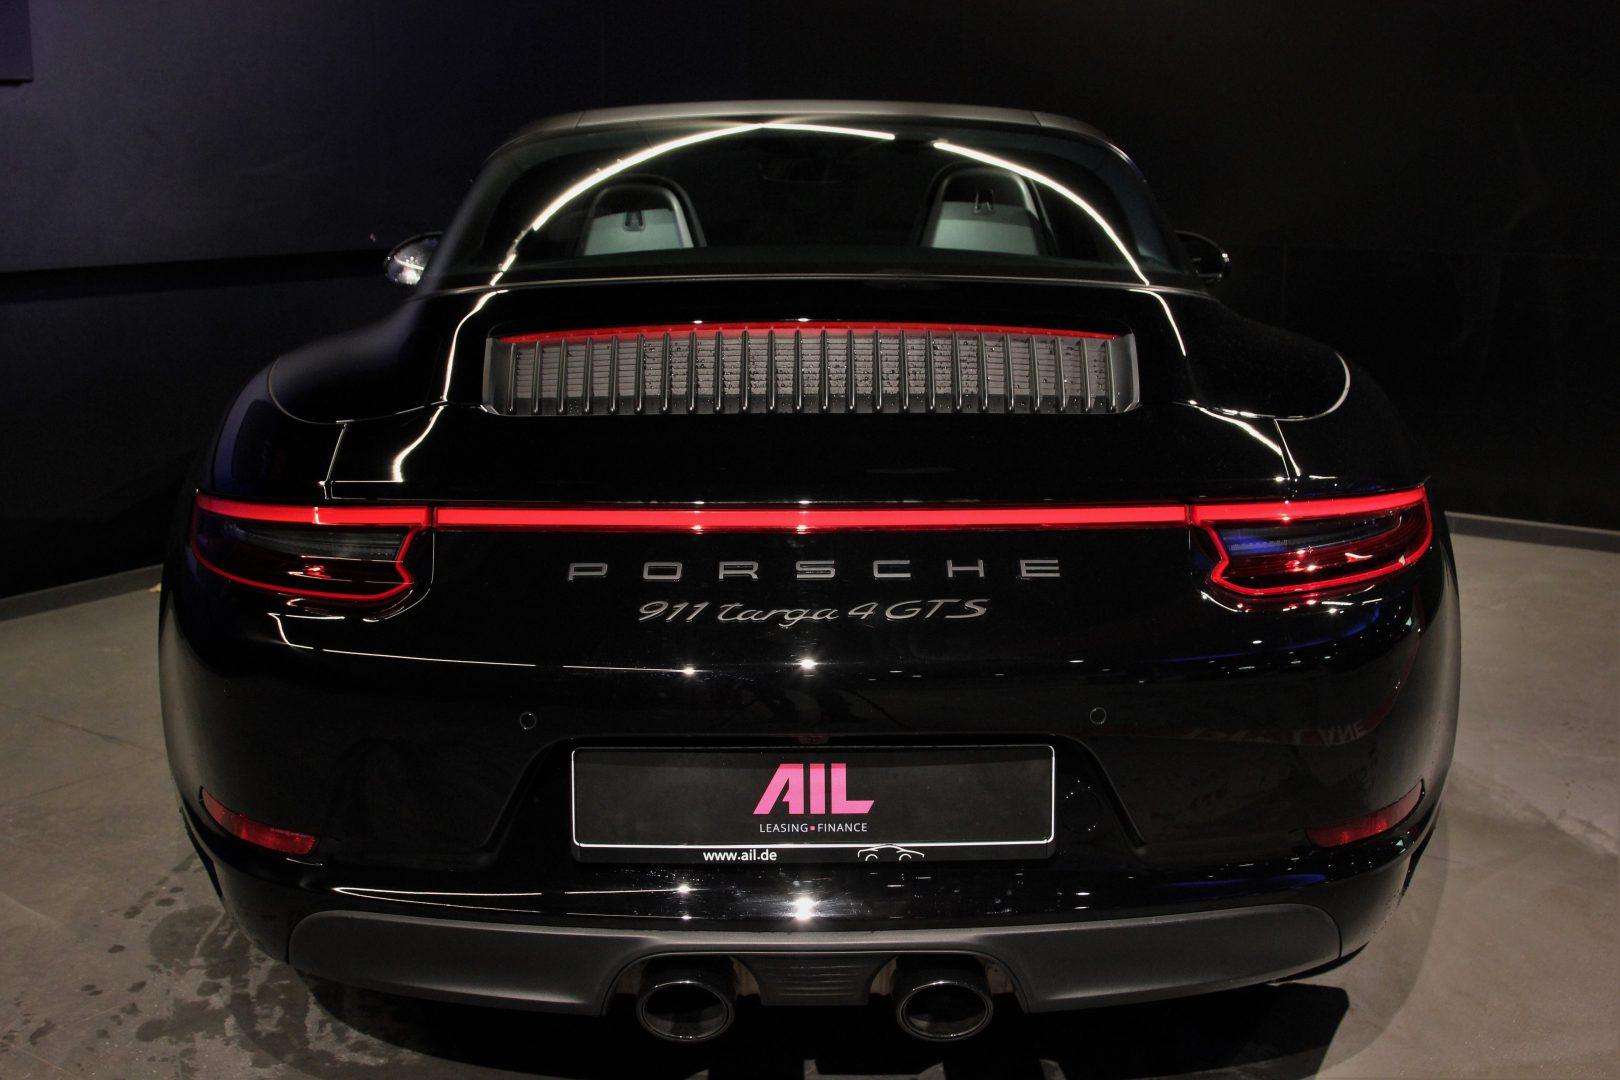 AIL Porsche 911 991 Targa 4 GTS Sport-Chrono-Paket LED Lift  5